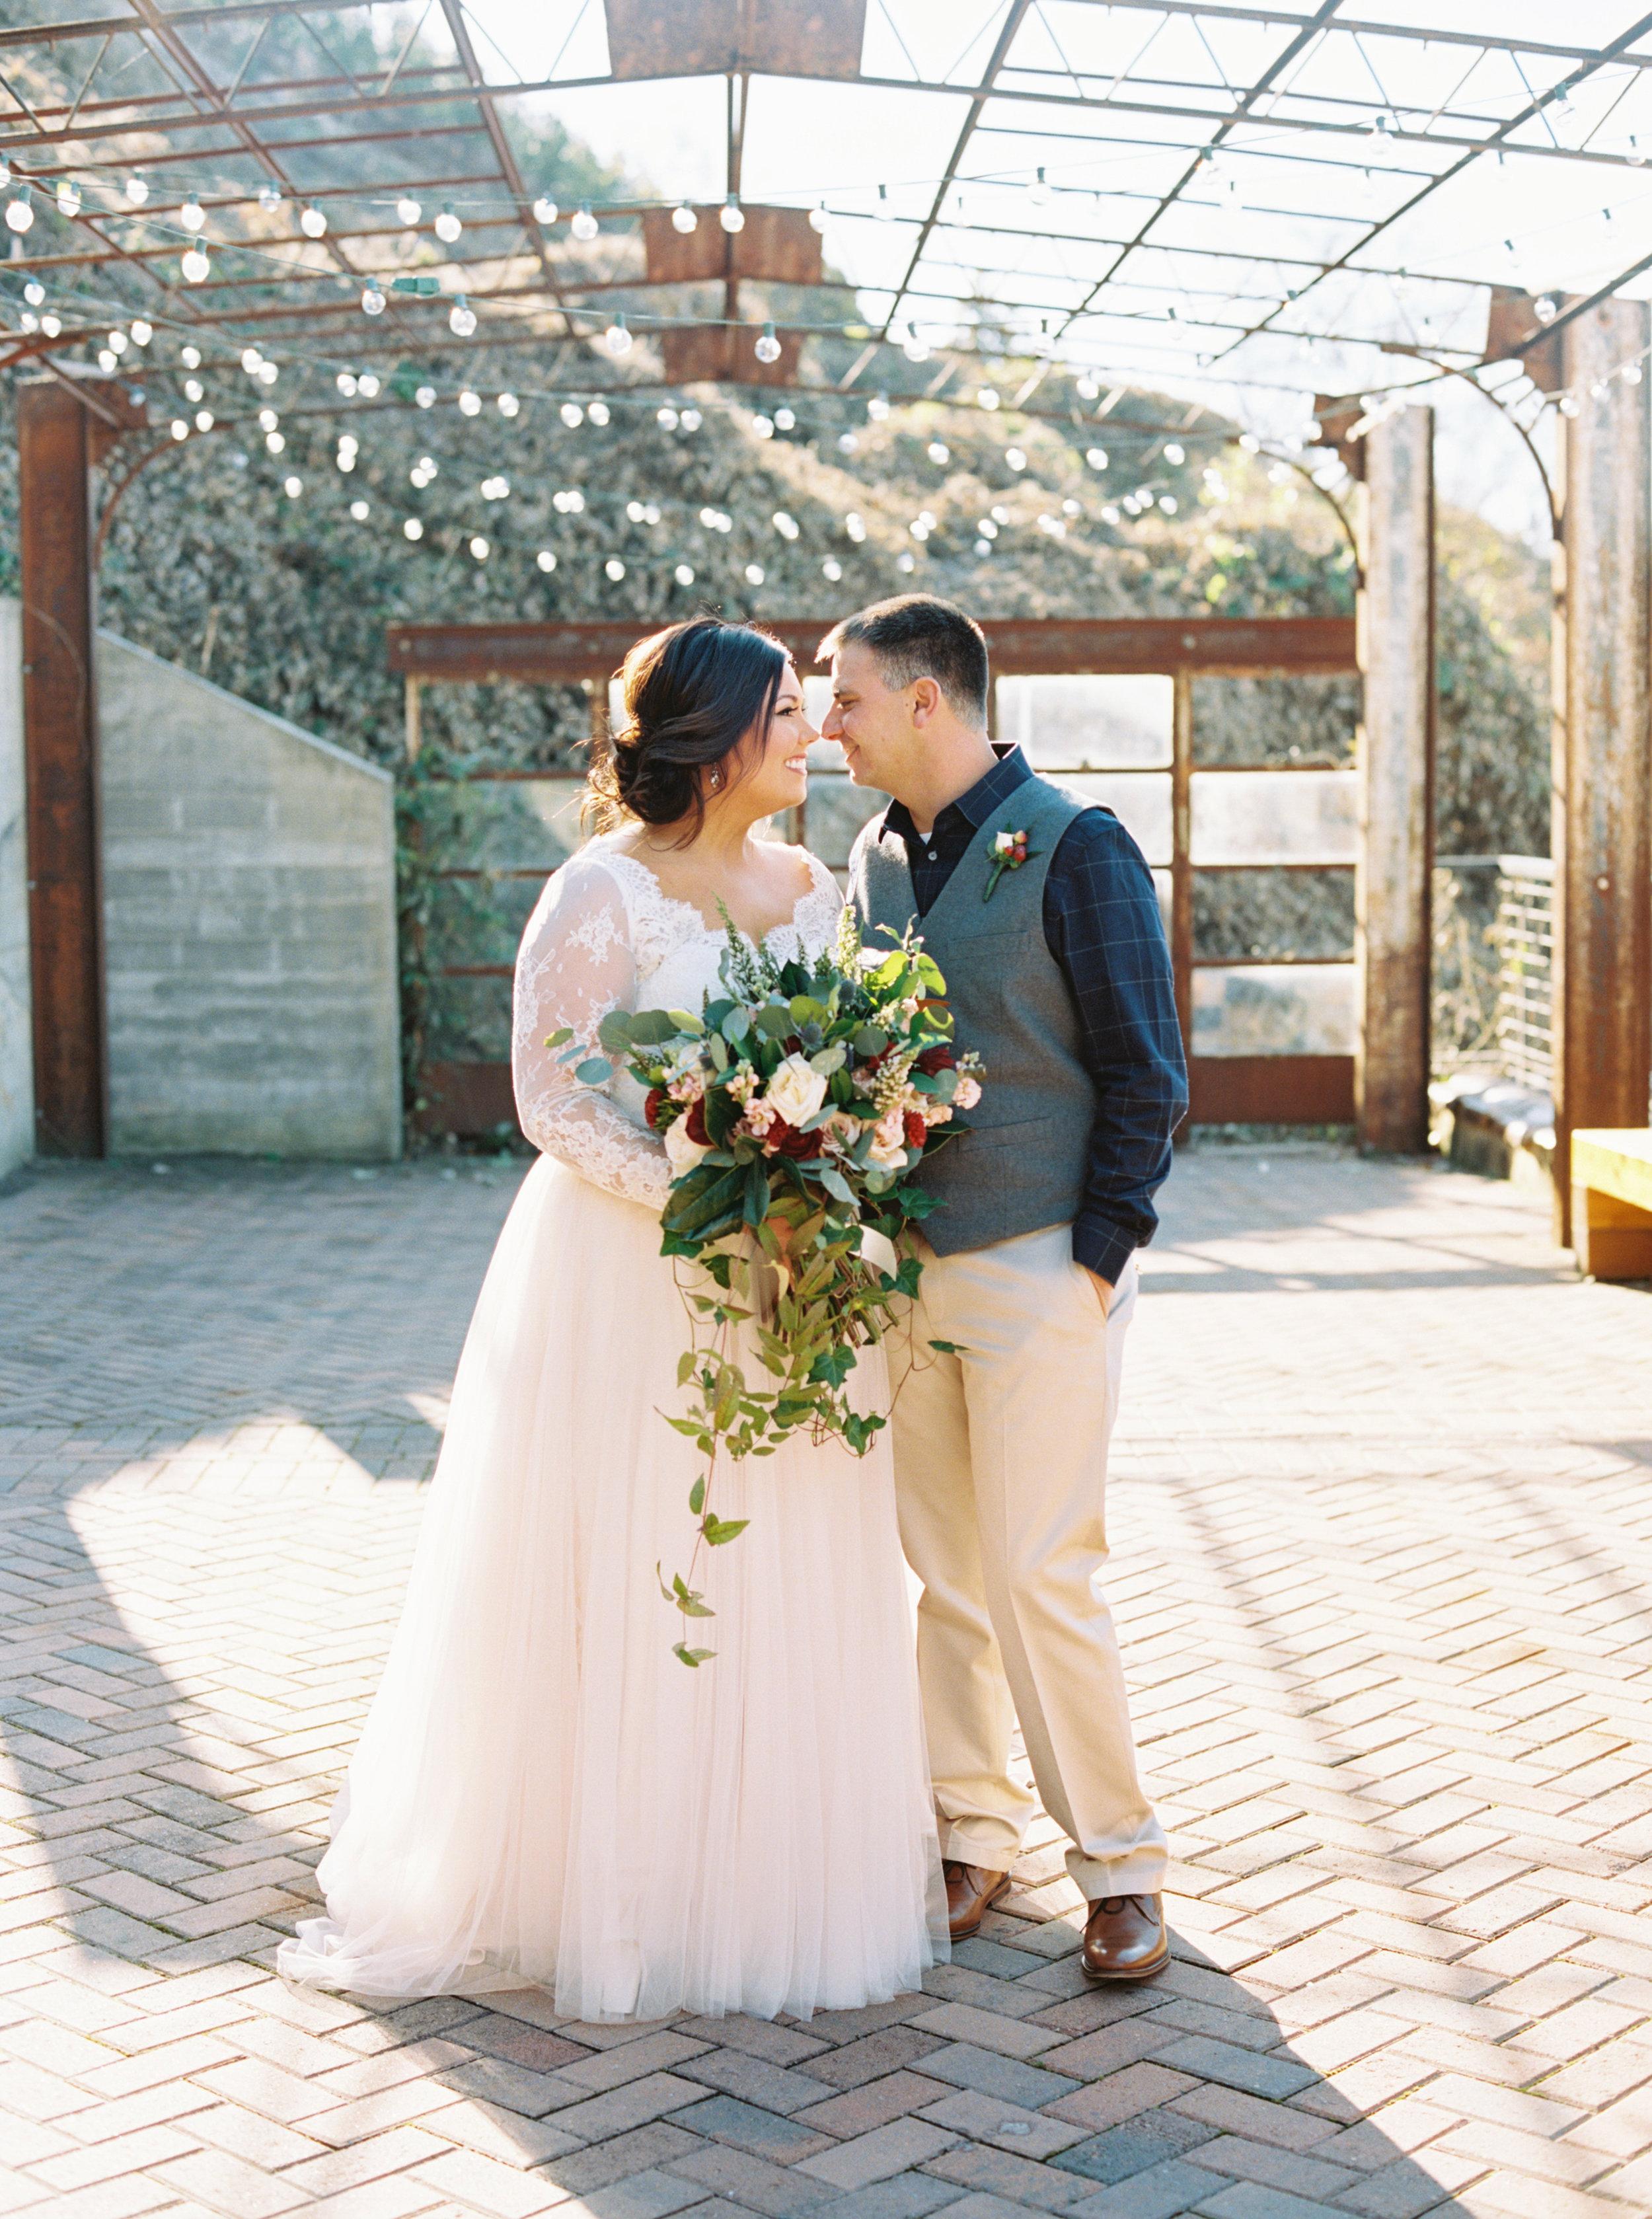 Lauren_Jeremy_Standard_Wedding_Knoxville_Abigail_Malone_Photography_FIlm-182.jpg